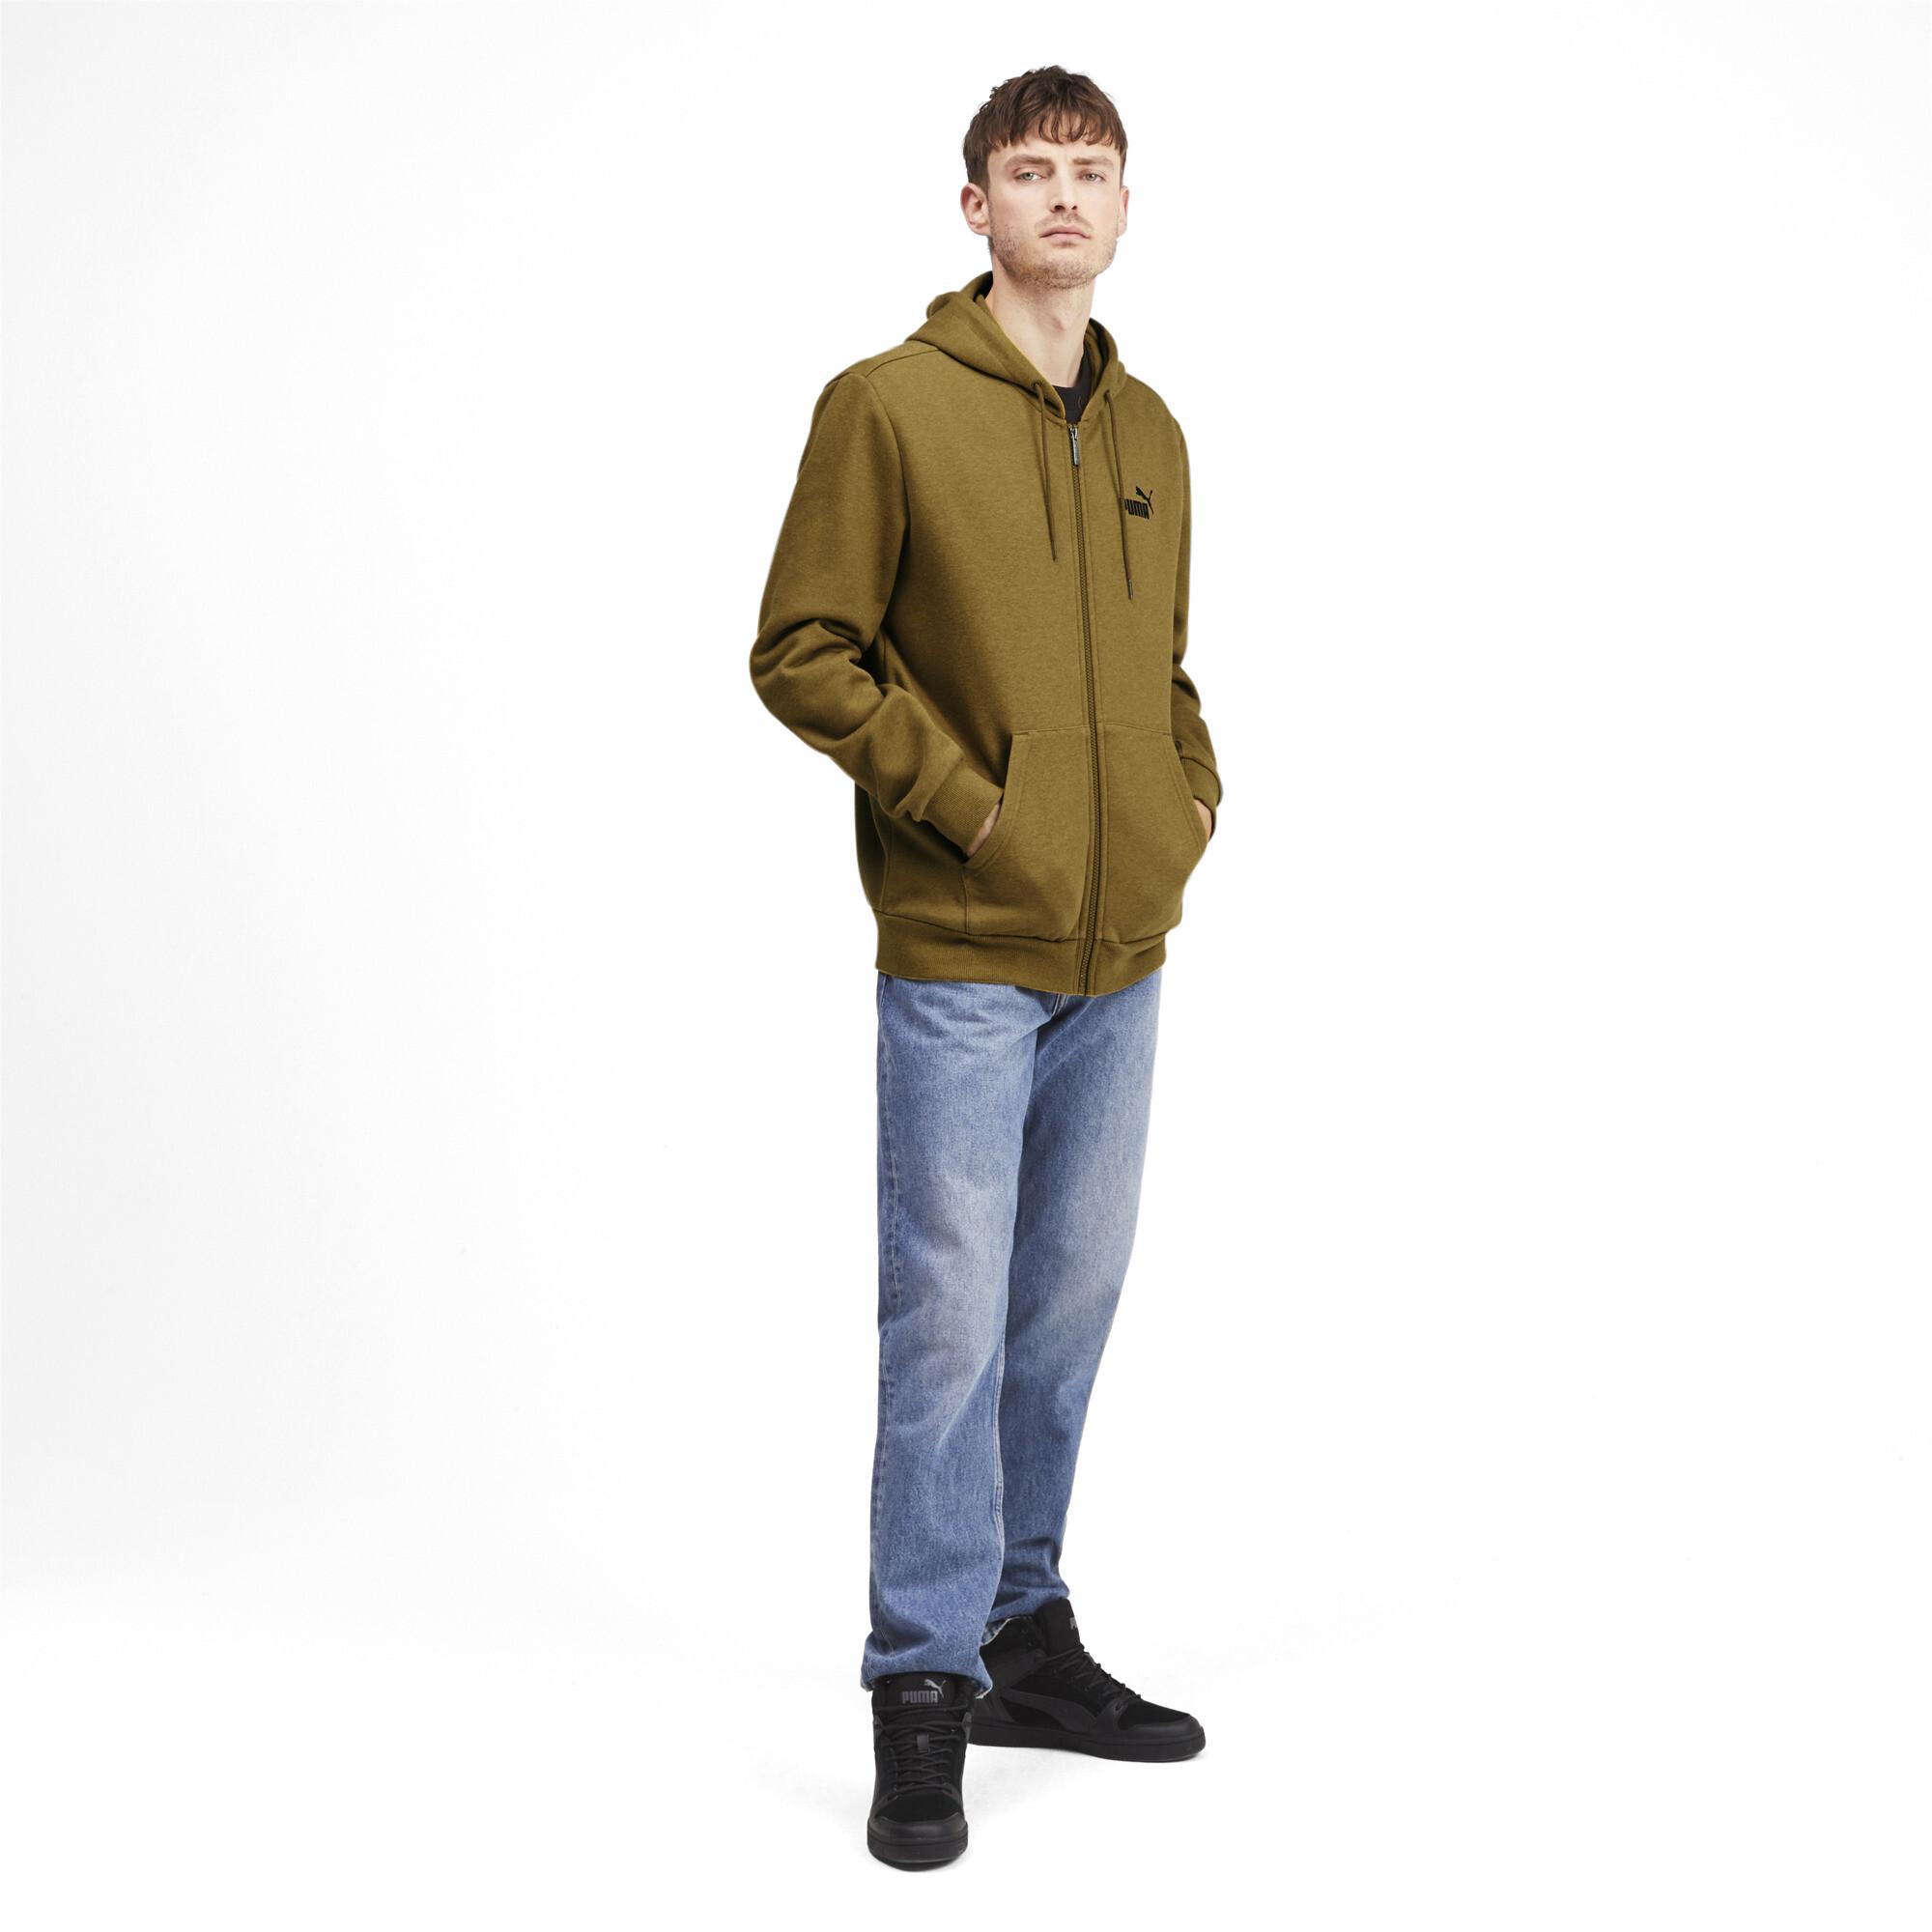 PUMA-Essentials-Men-039-s-Fleece-Hooded-Jacket-Men-Sweat-Basics thumbnail 24